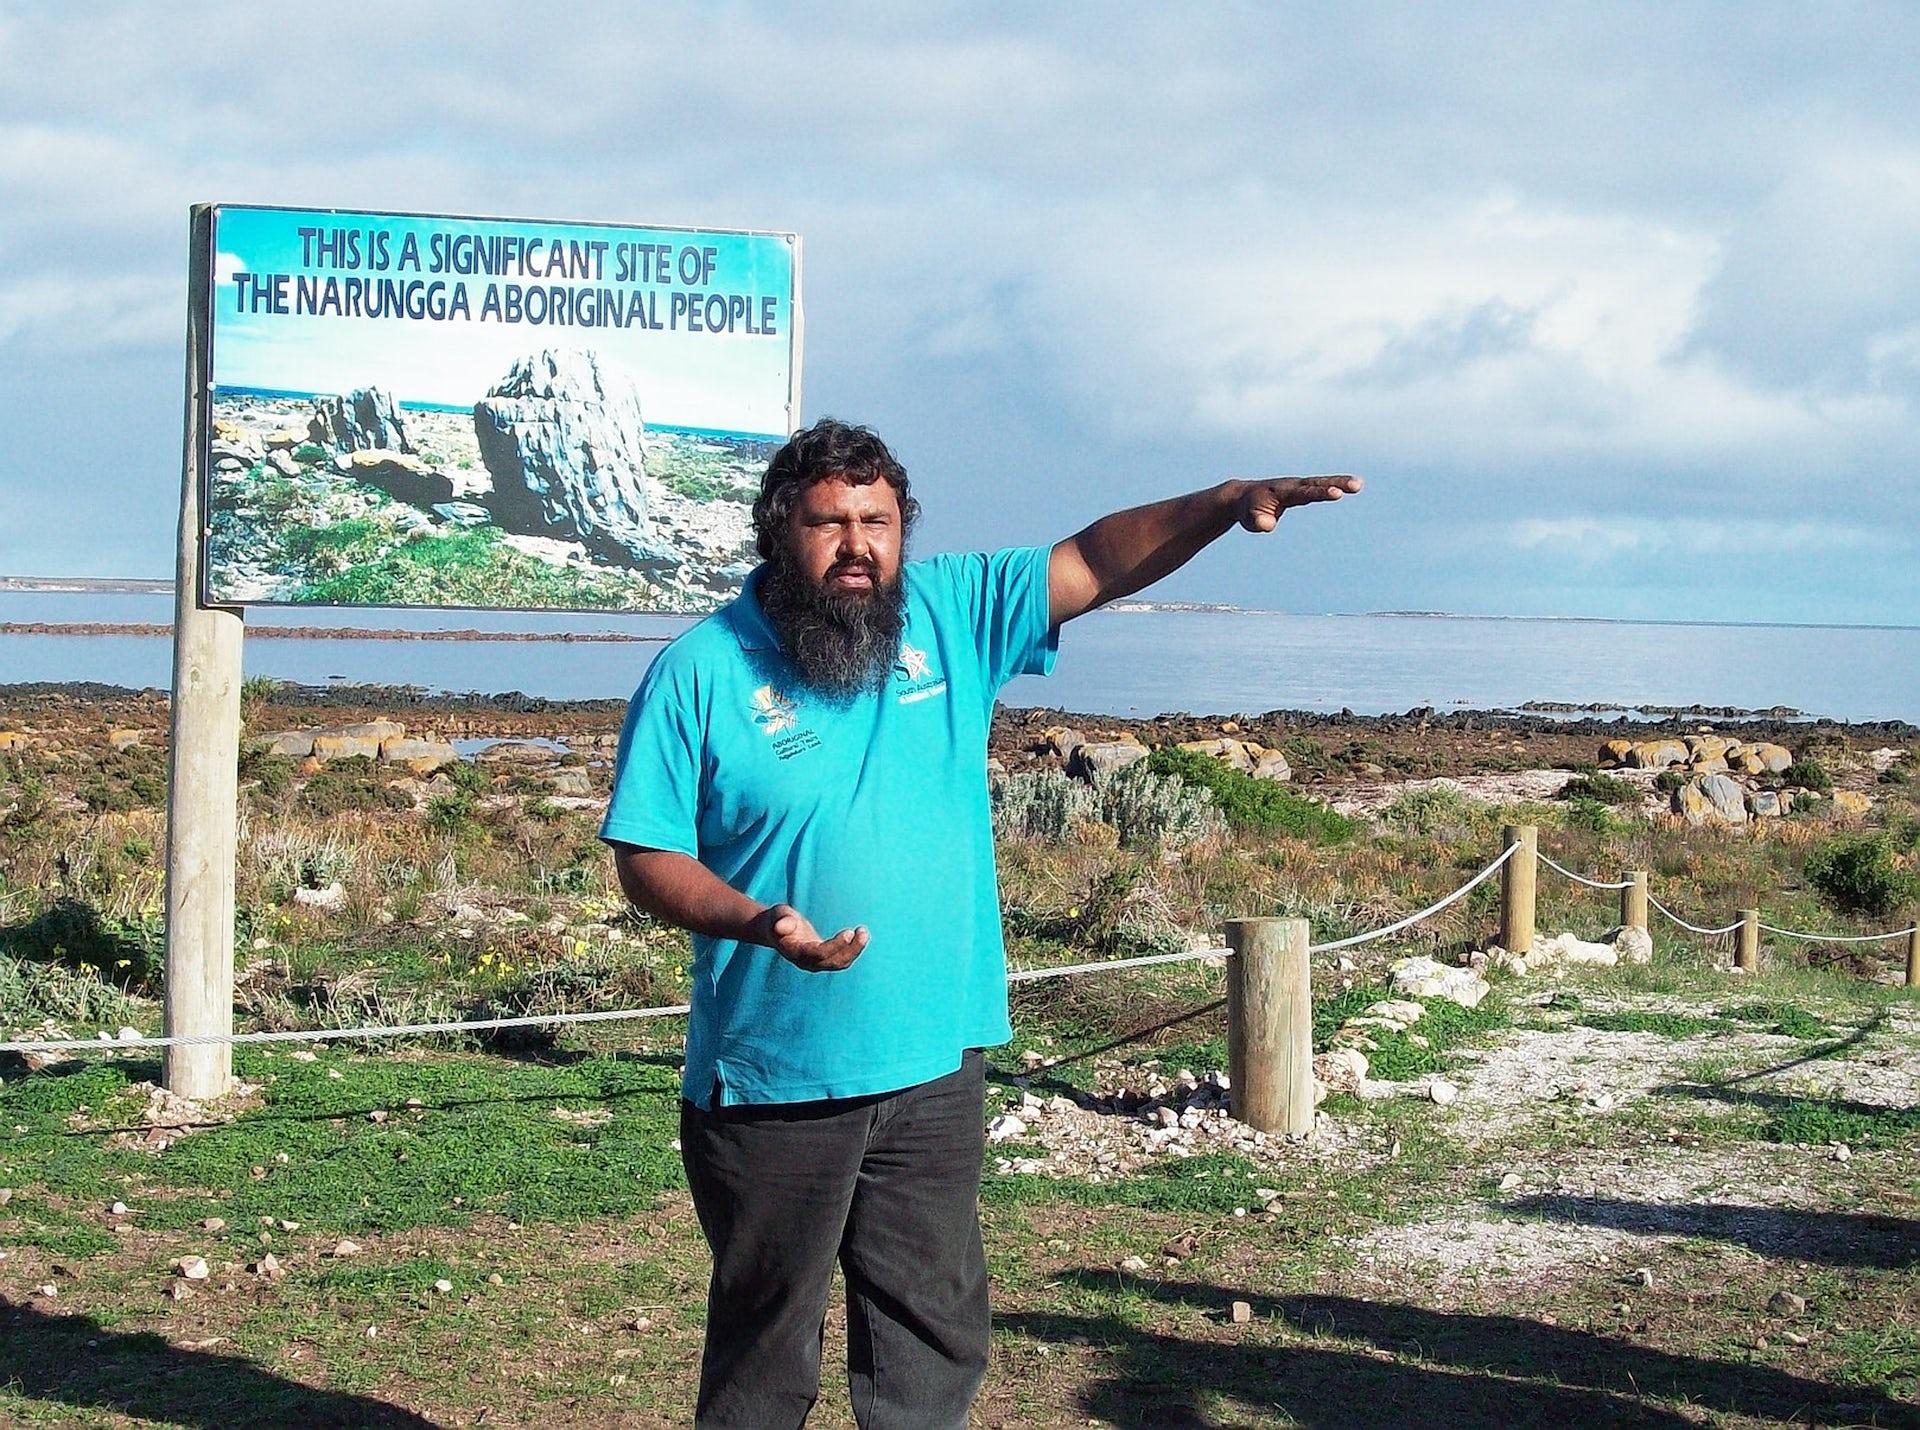 council for aboriginal reconciliation